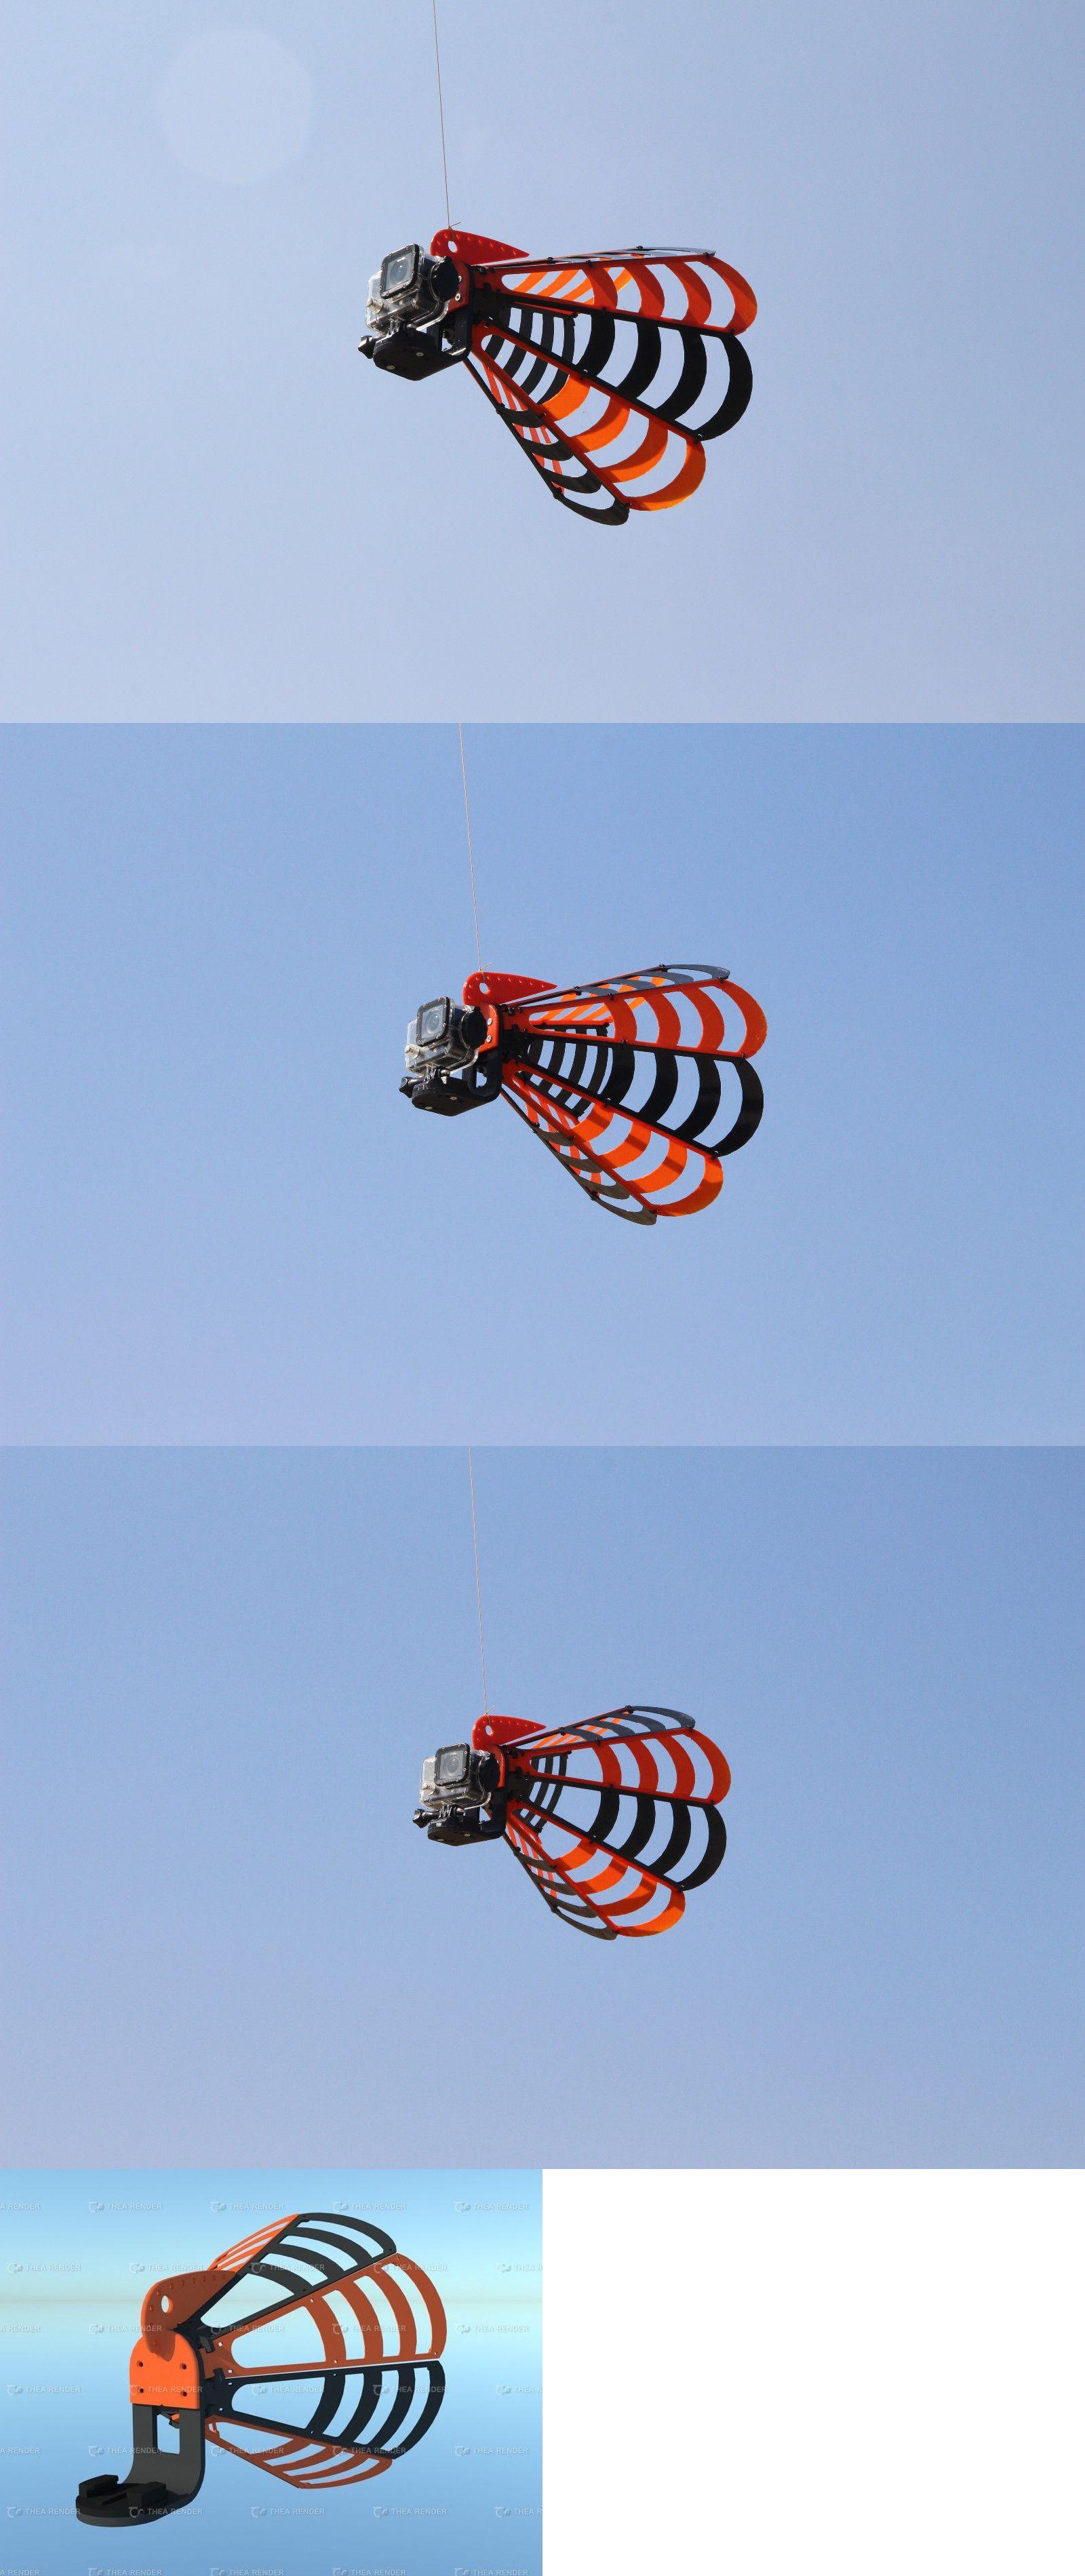 "/""Spider v4/"" Chasecam Chase Cam for Paragliding Paramotor PPG"